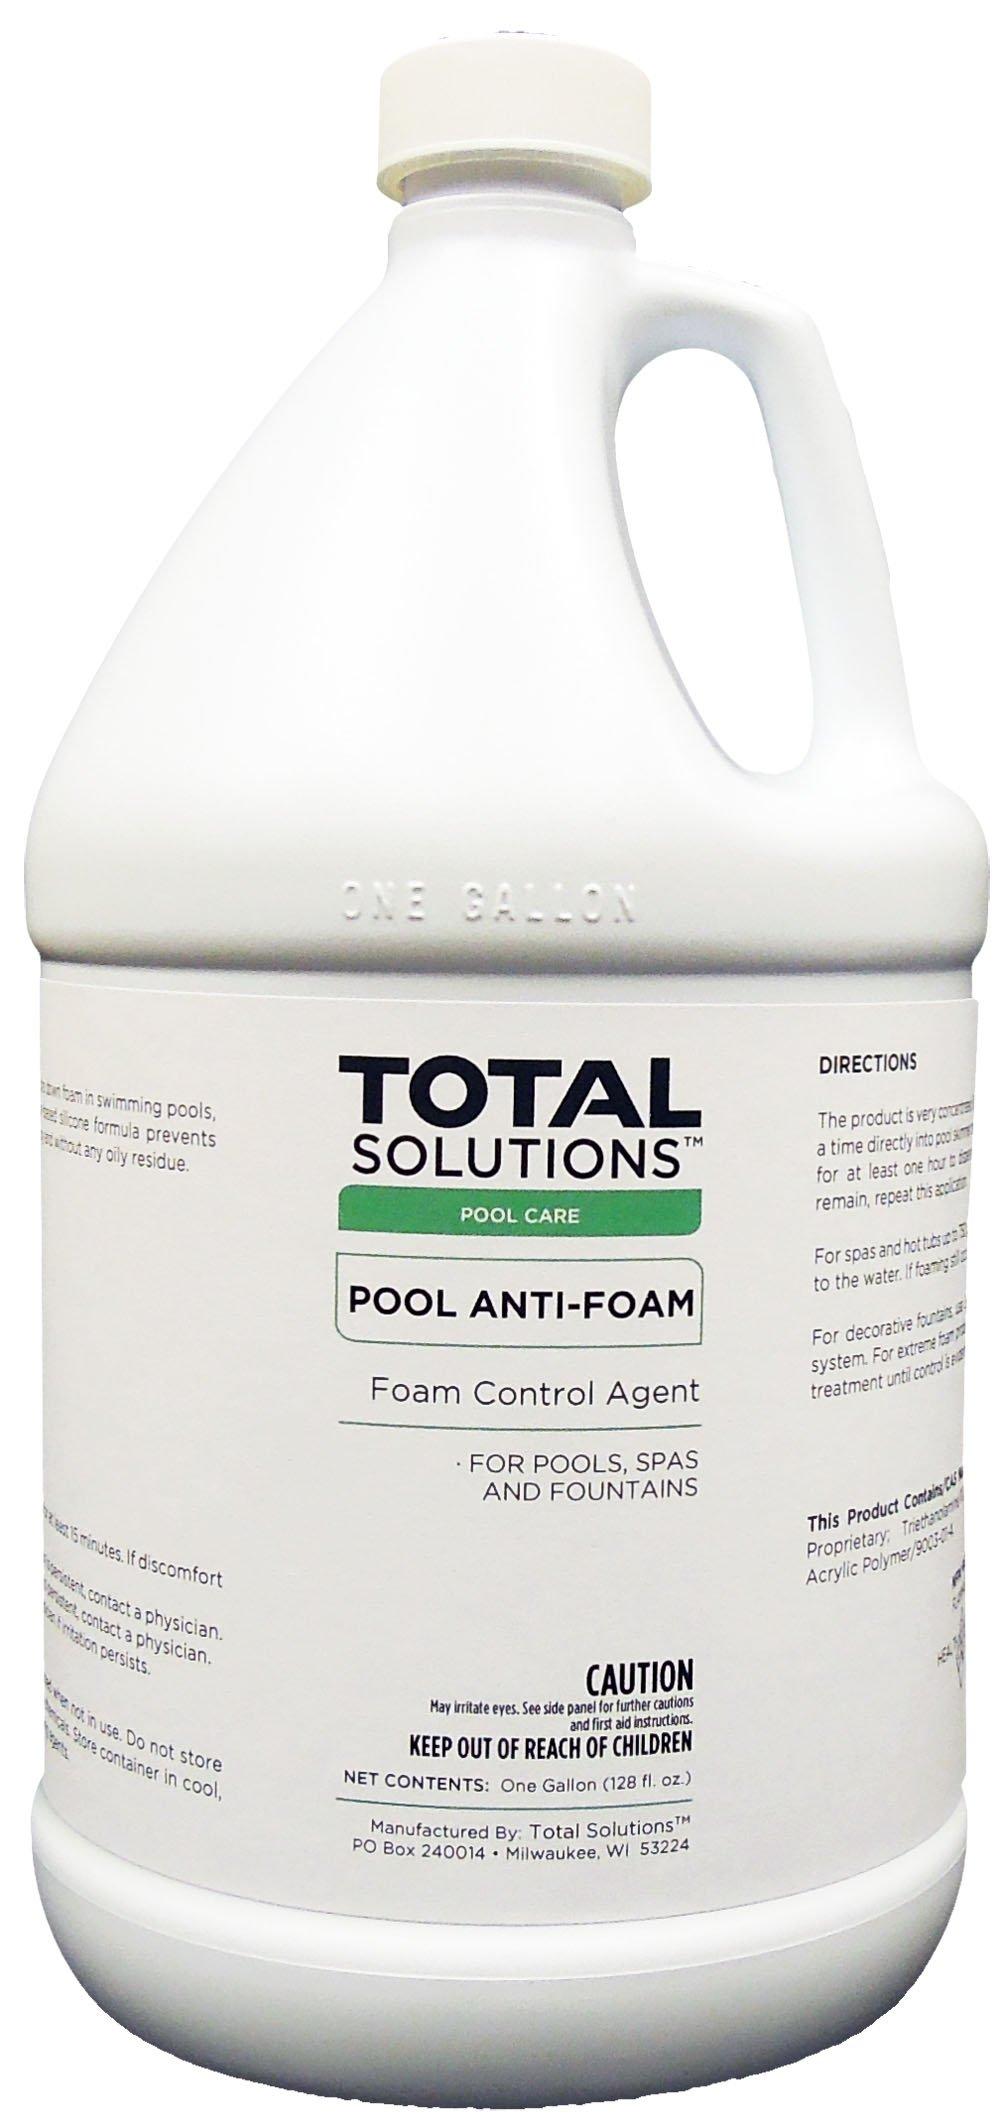 Pool Anti-Foam, Eliminates foam in pools, spas & fountains- 4 Gallons